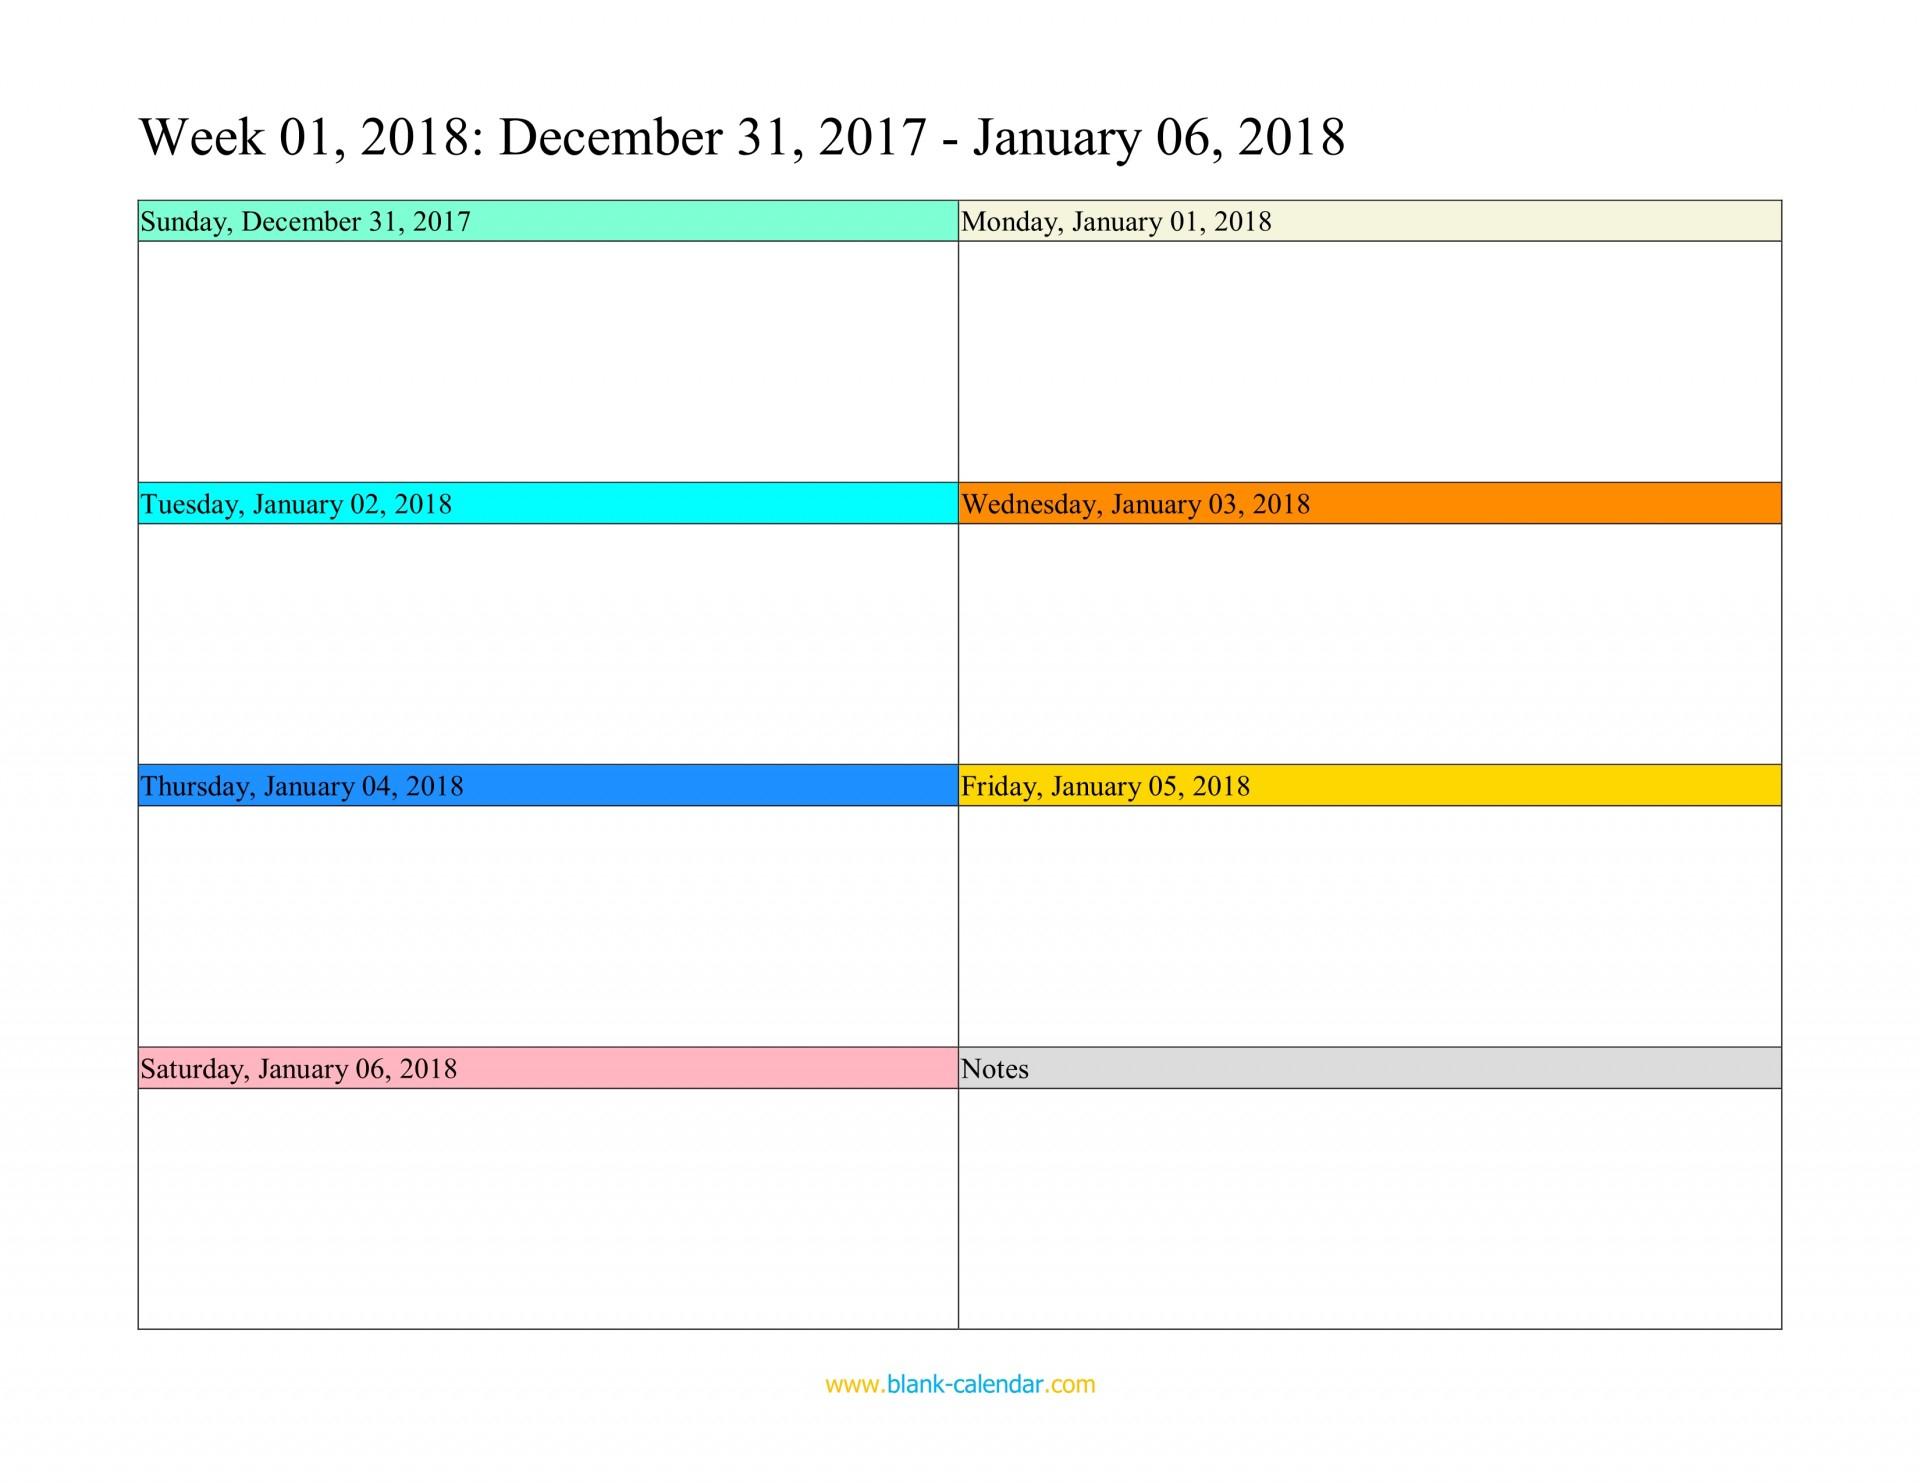 012 Printable Word Weekly Calendar Template Stunning 2018 Free with August-December Calendar Template